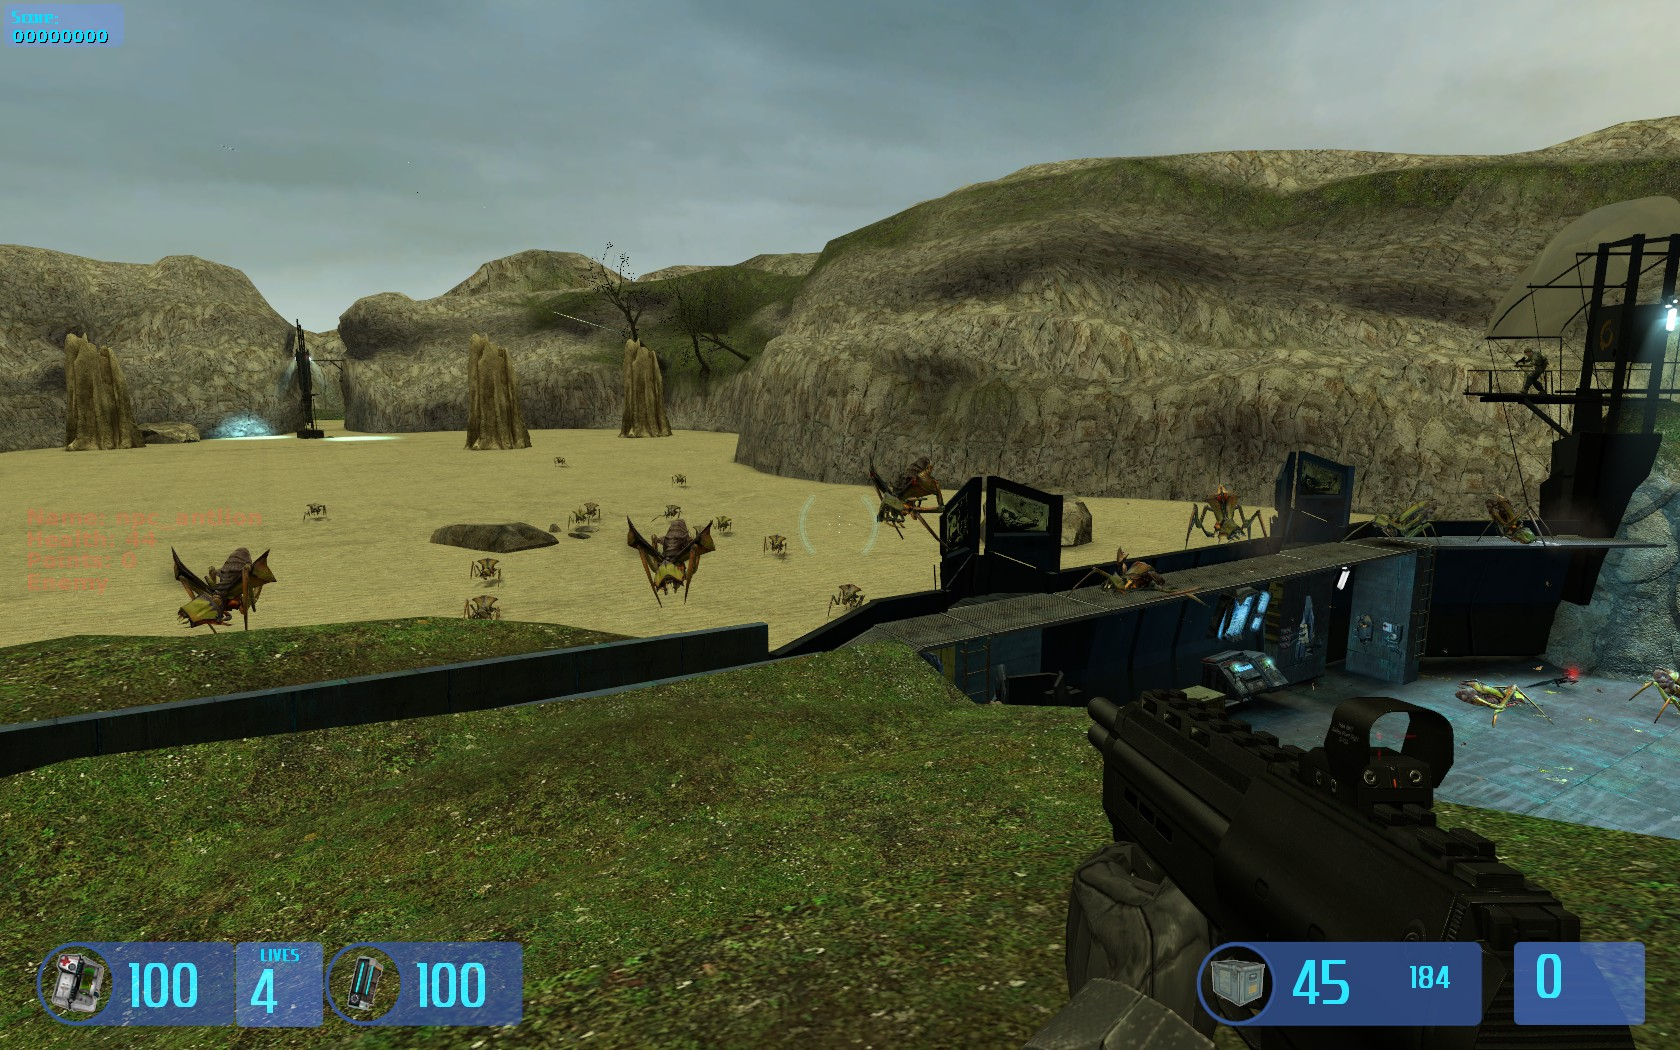 Houndeye npc image - obsidian conflict mod for half-life 2